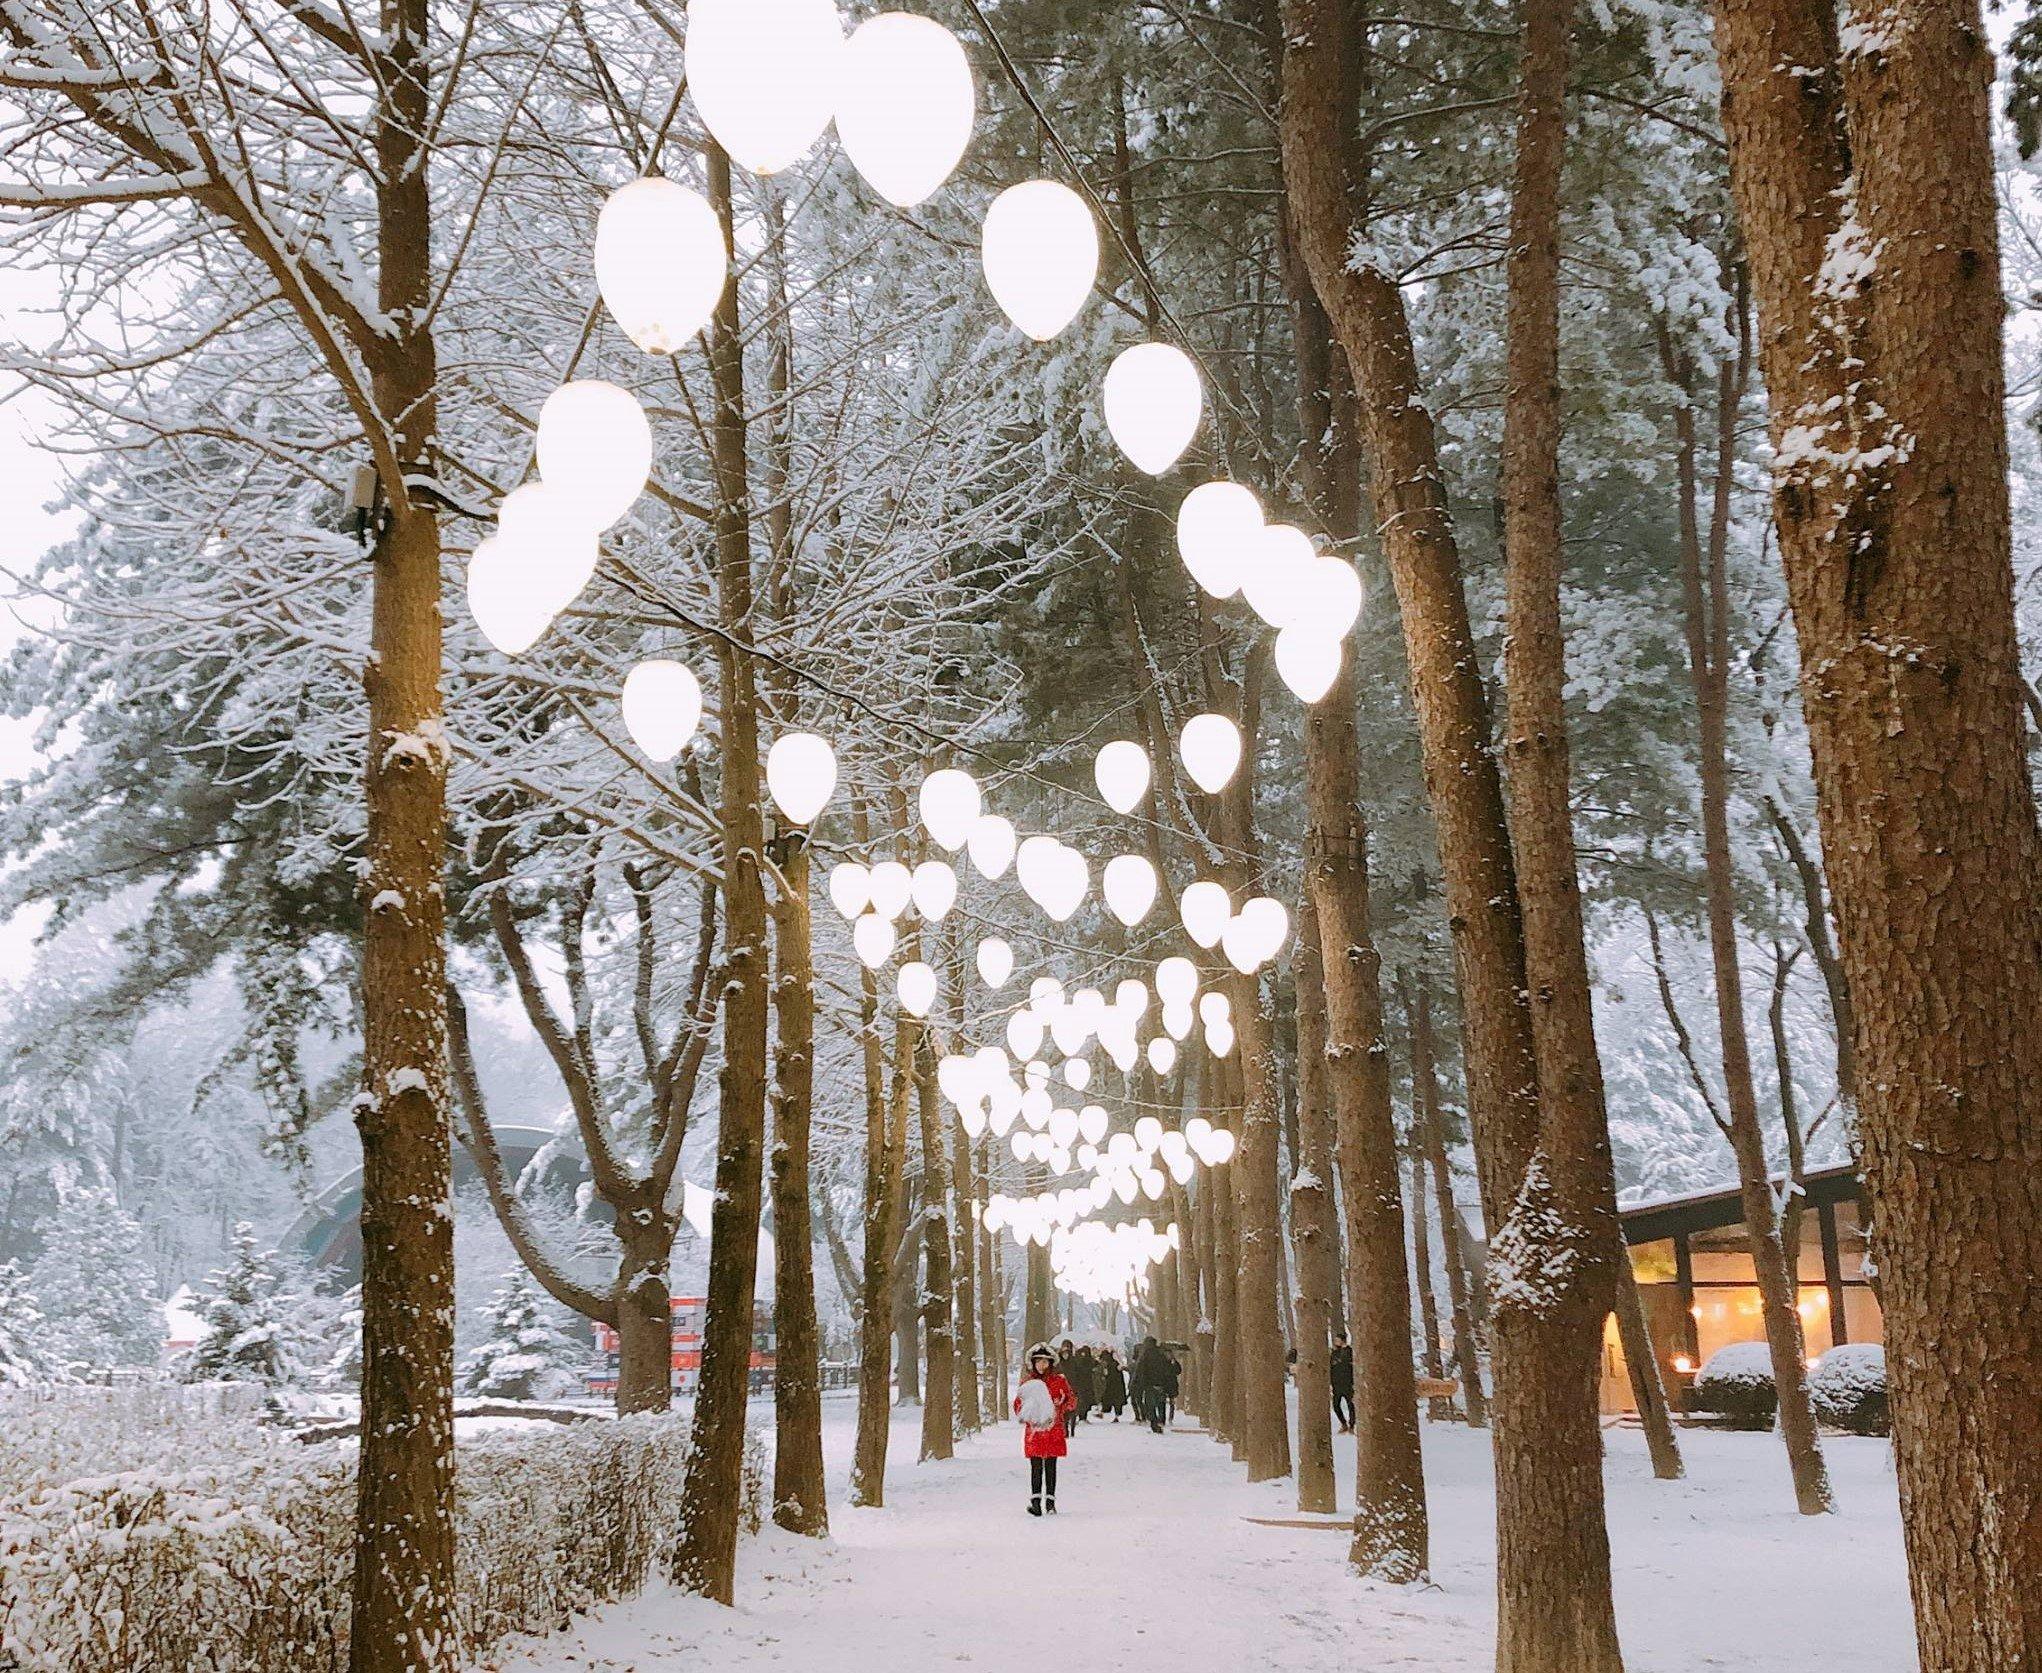 Nami Island Korea Winter View